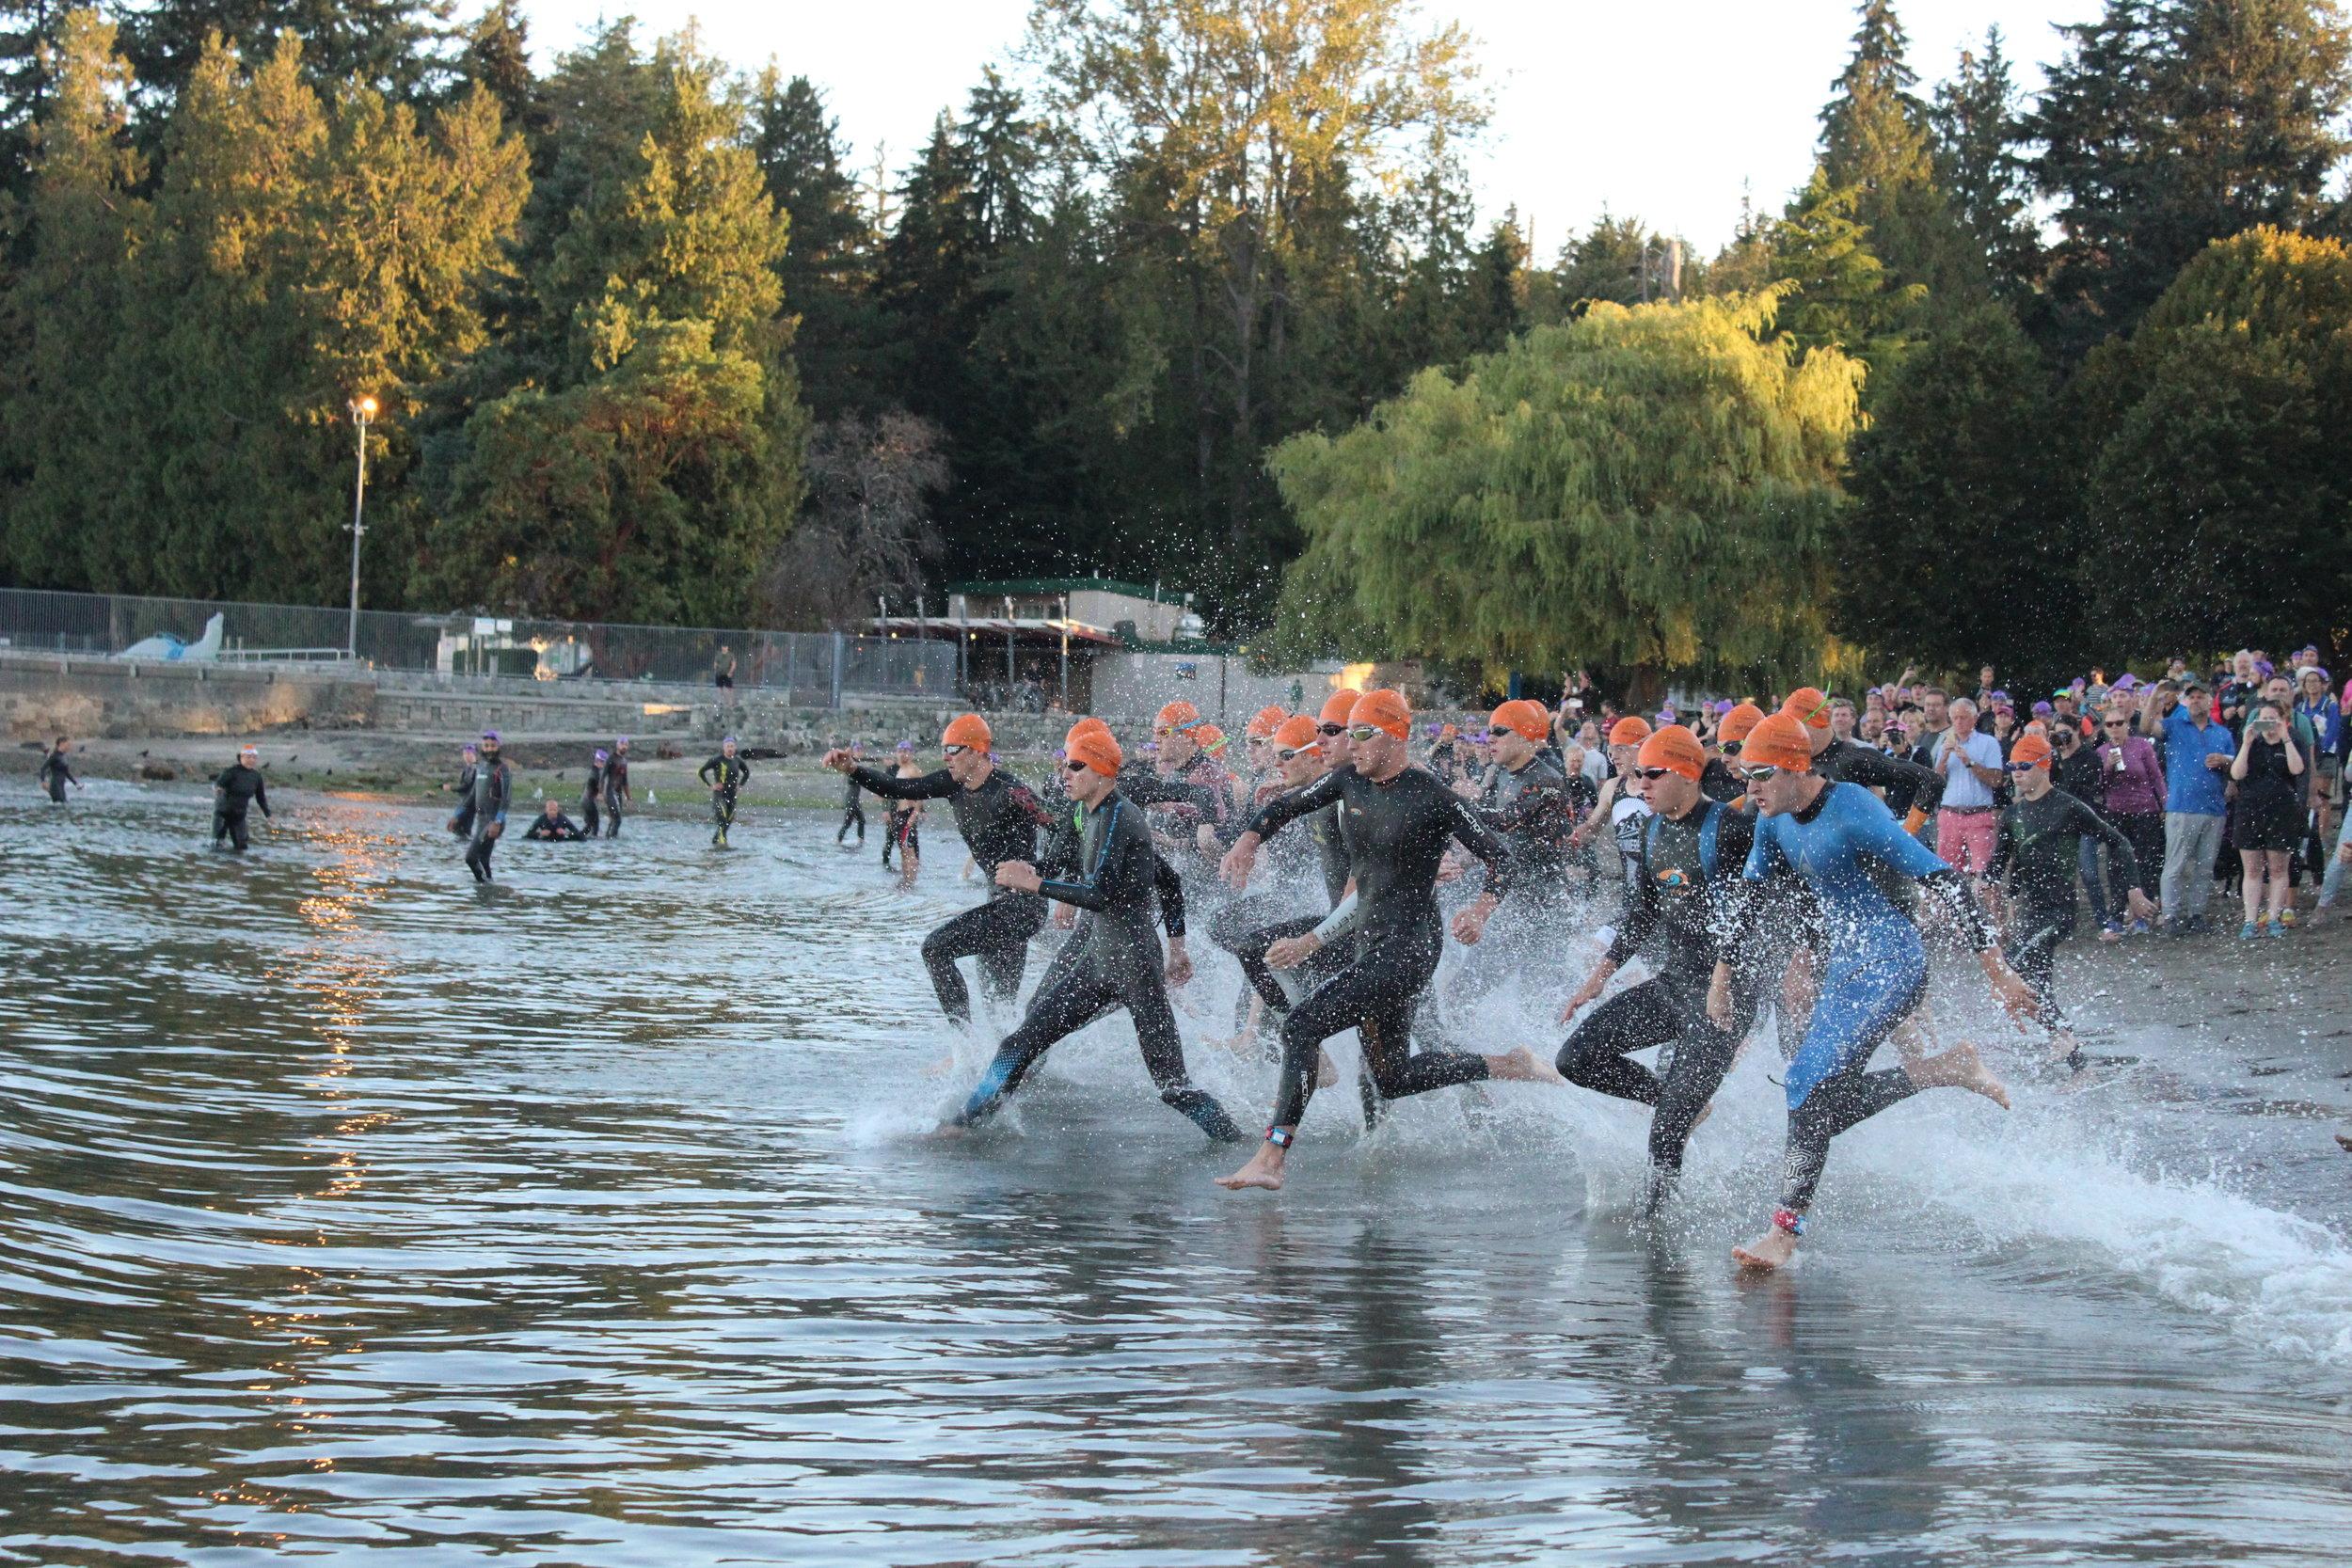 Triathlon Coach at Race Swim Start